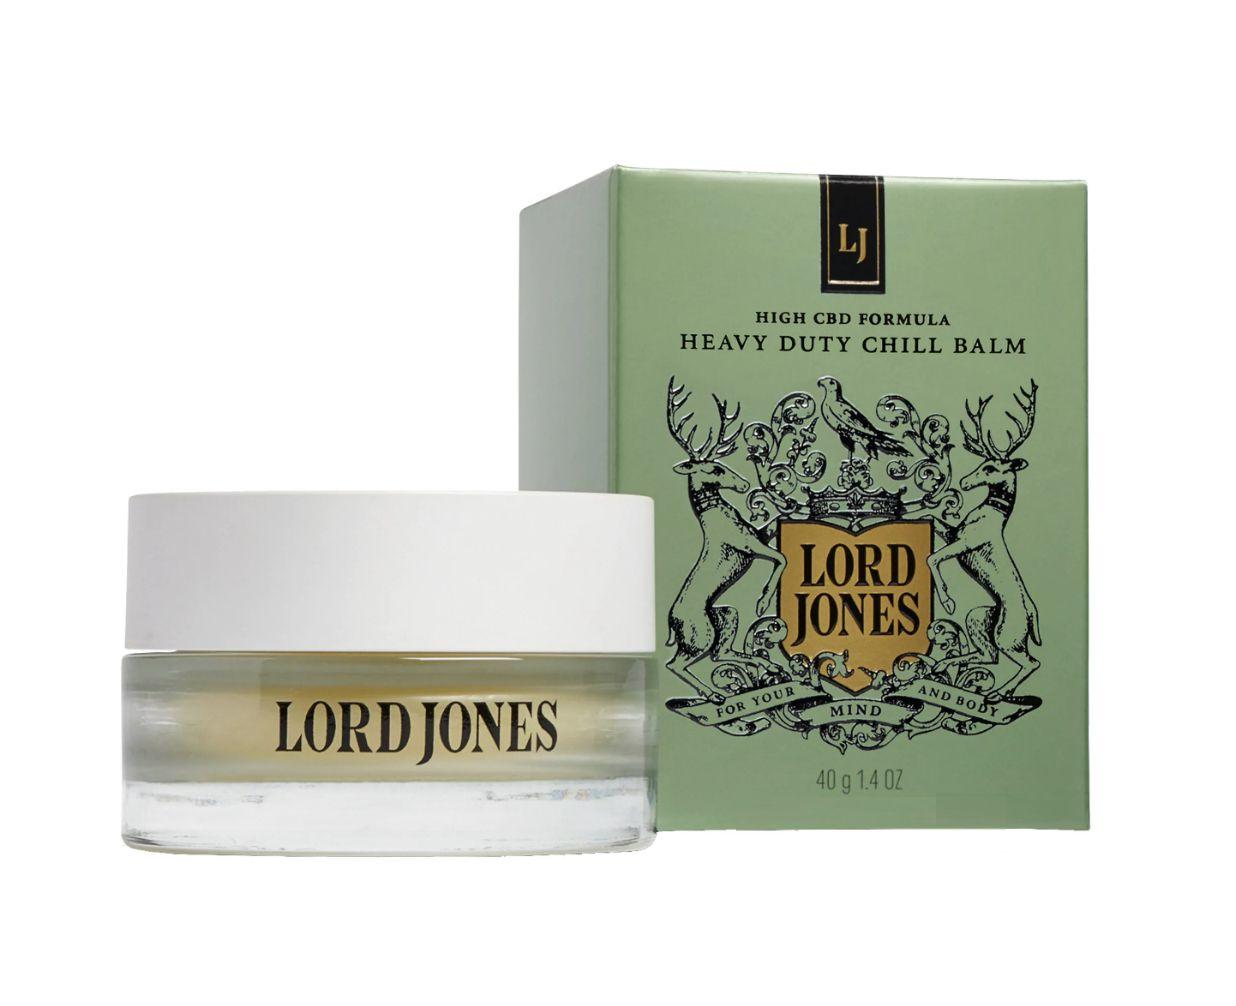 Lord Jones Chill Balm